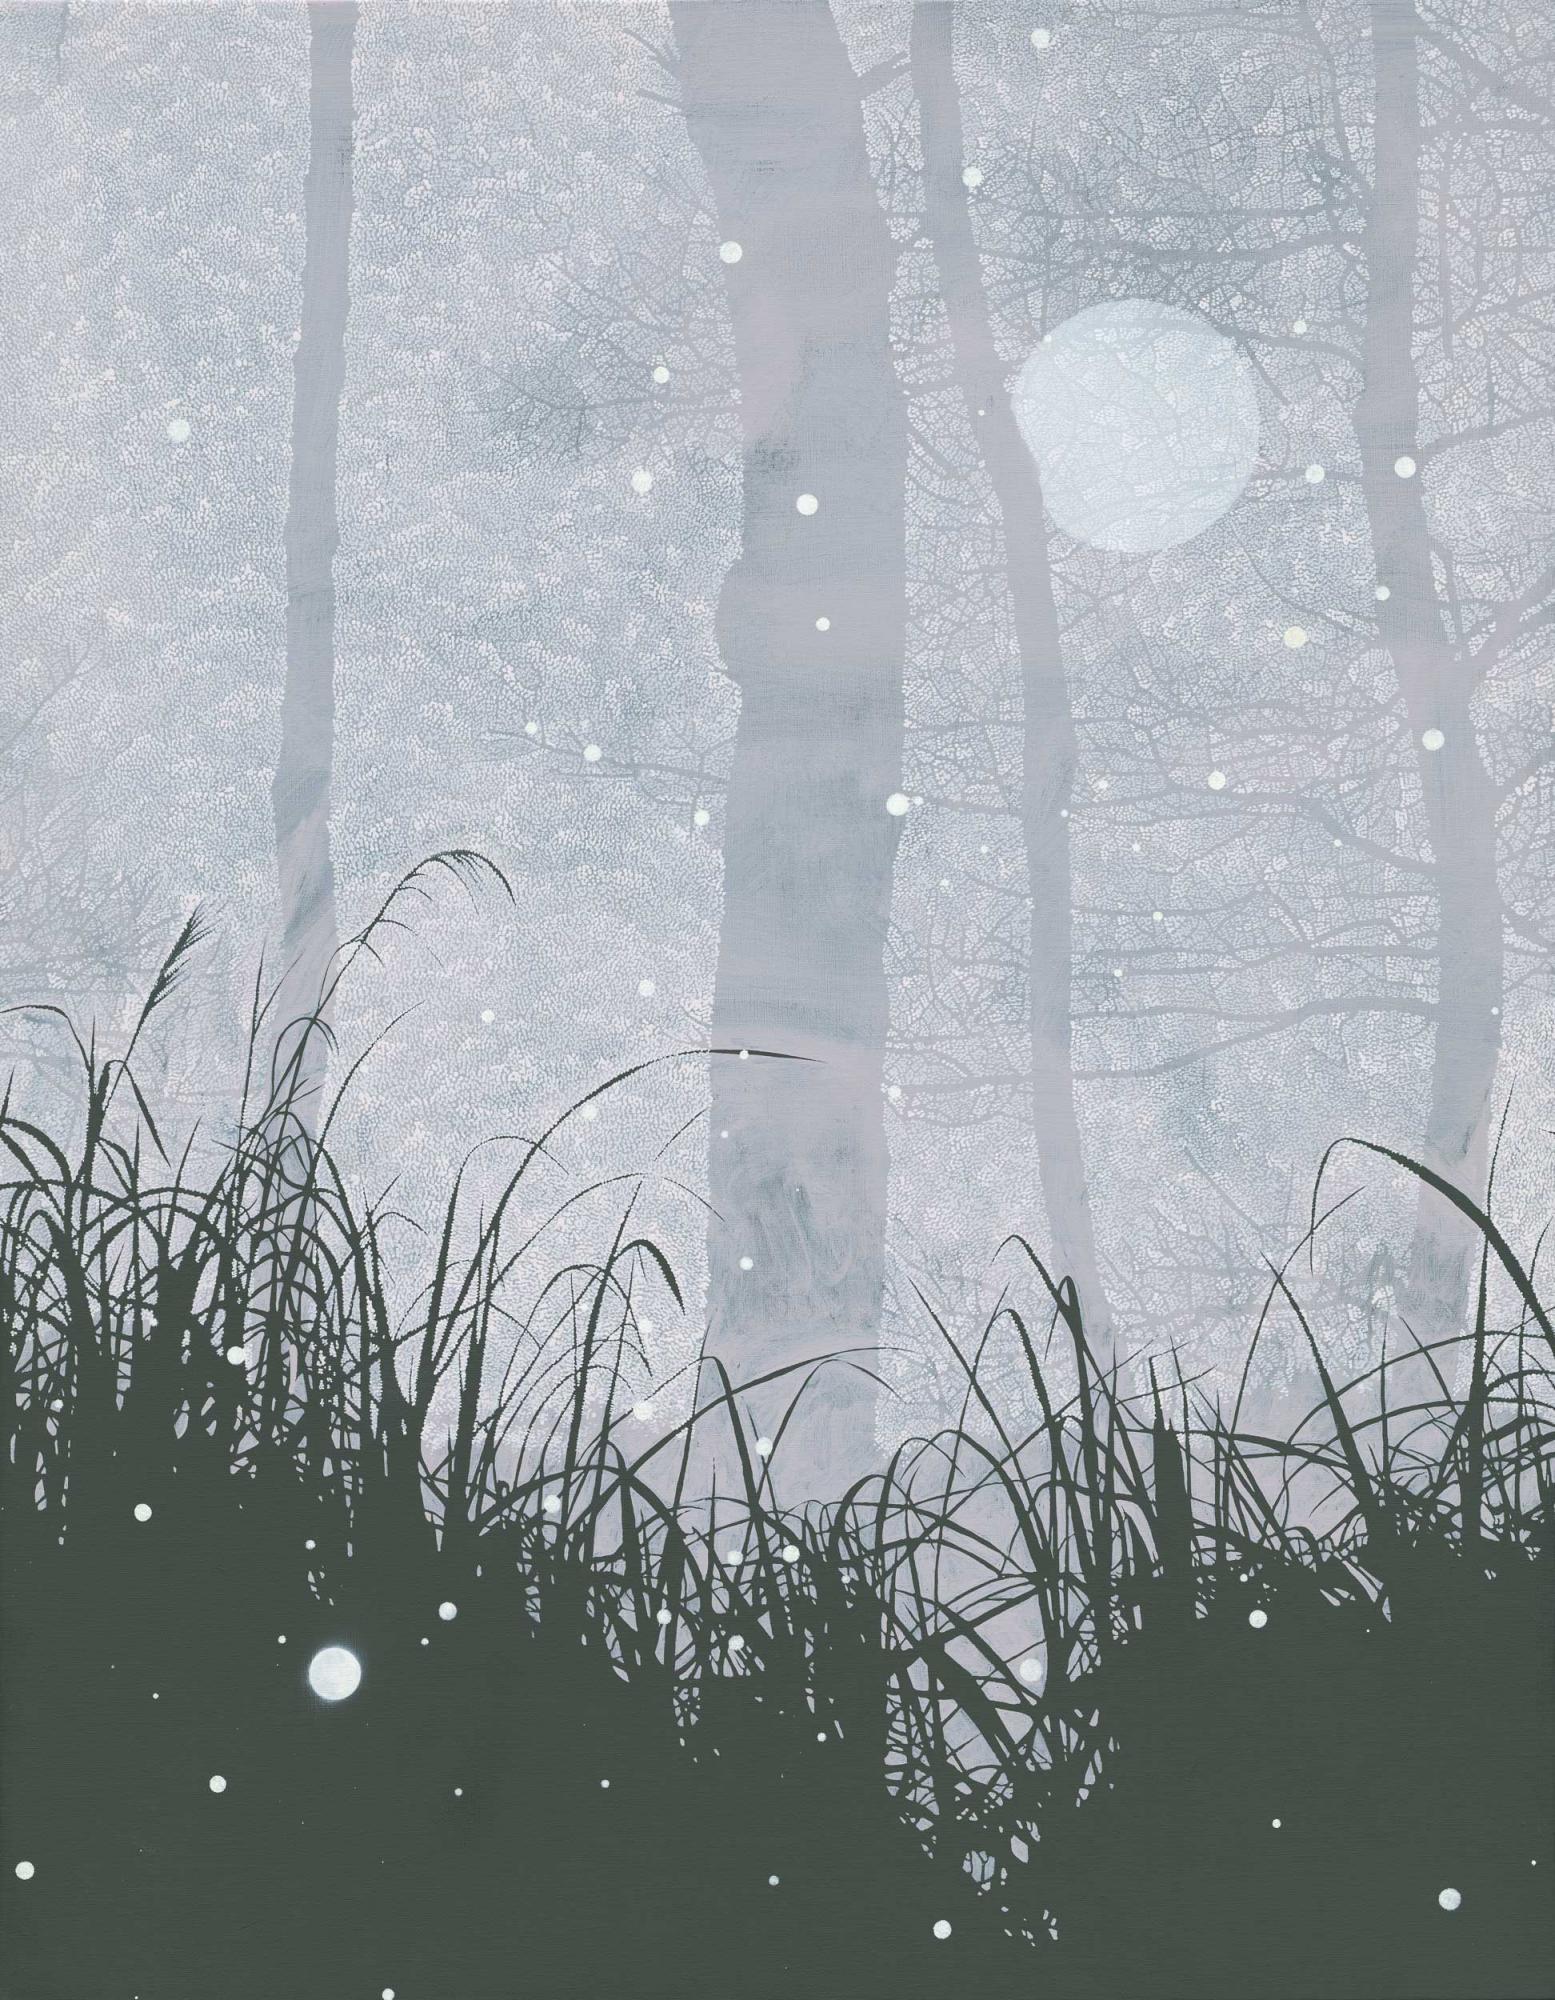 Snowing-A.jpg